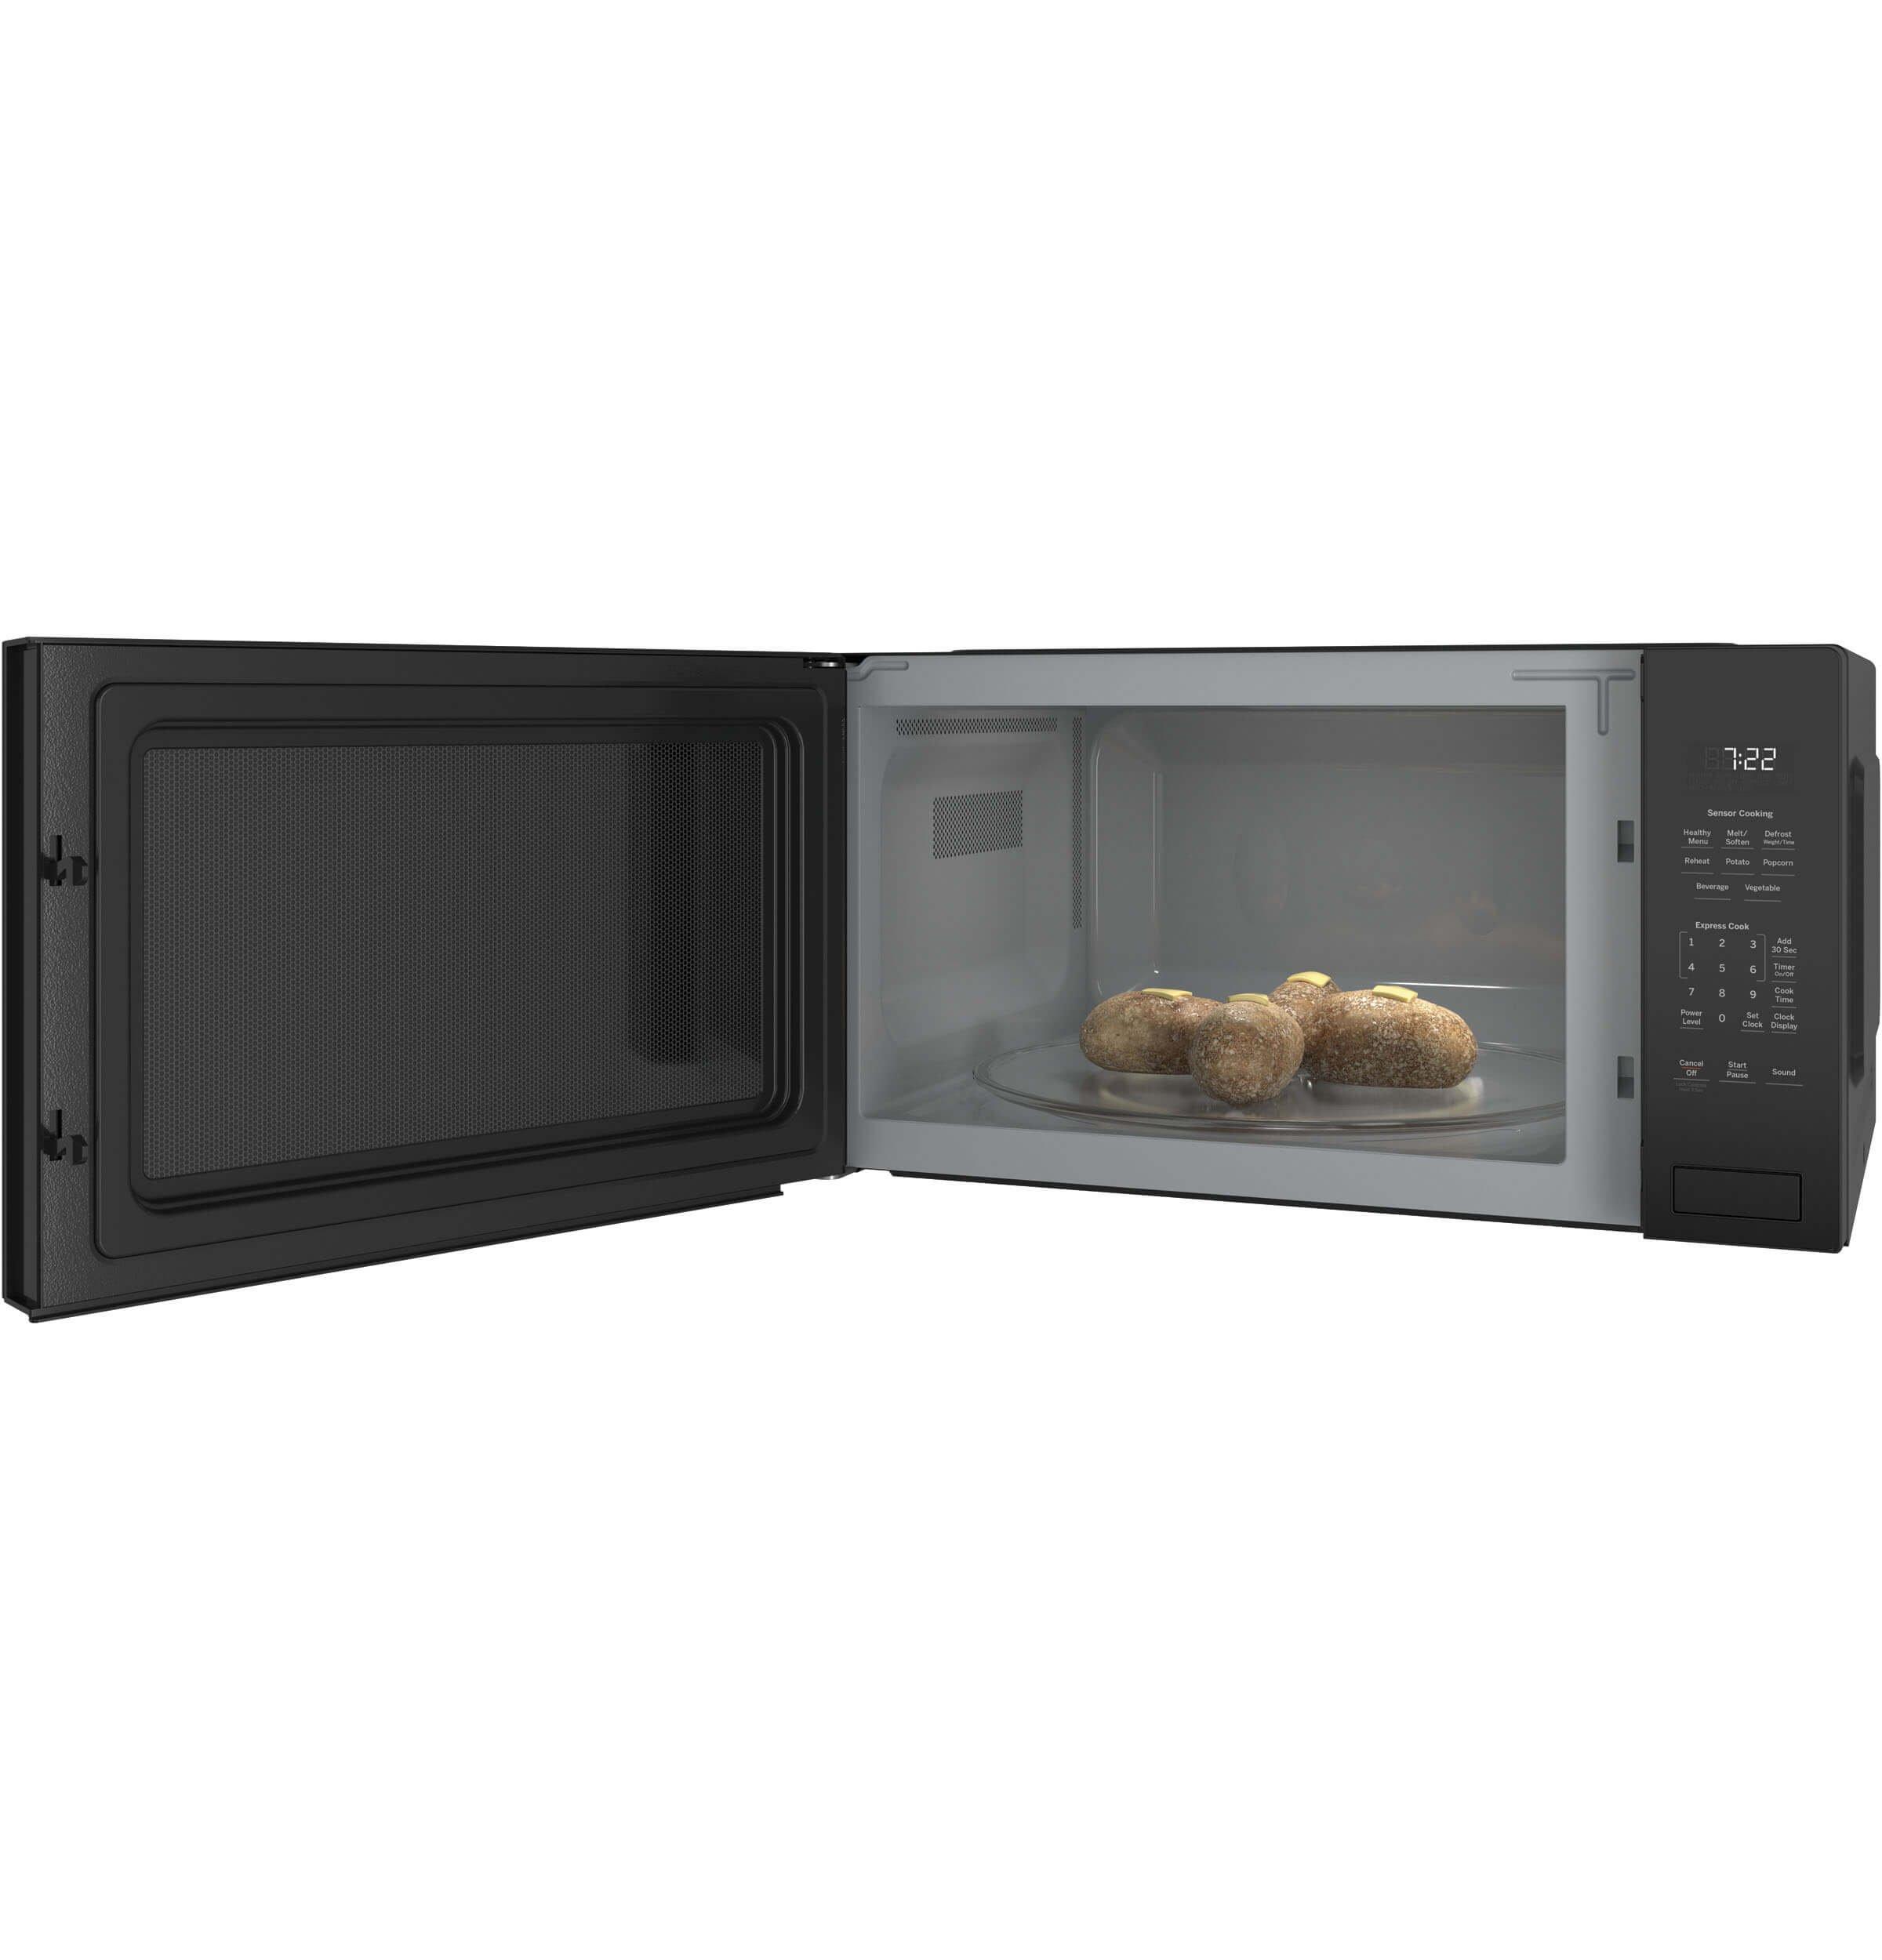 GE PEB7227DLBB Microwave Oven by GE (Image #4)